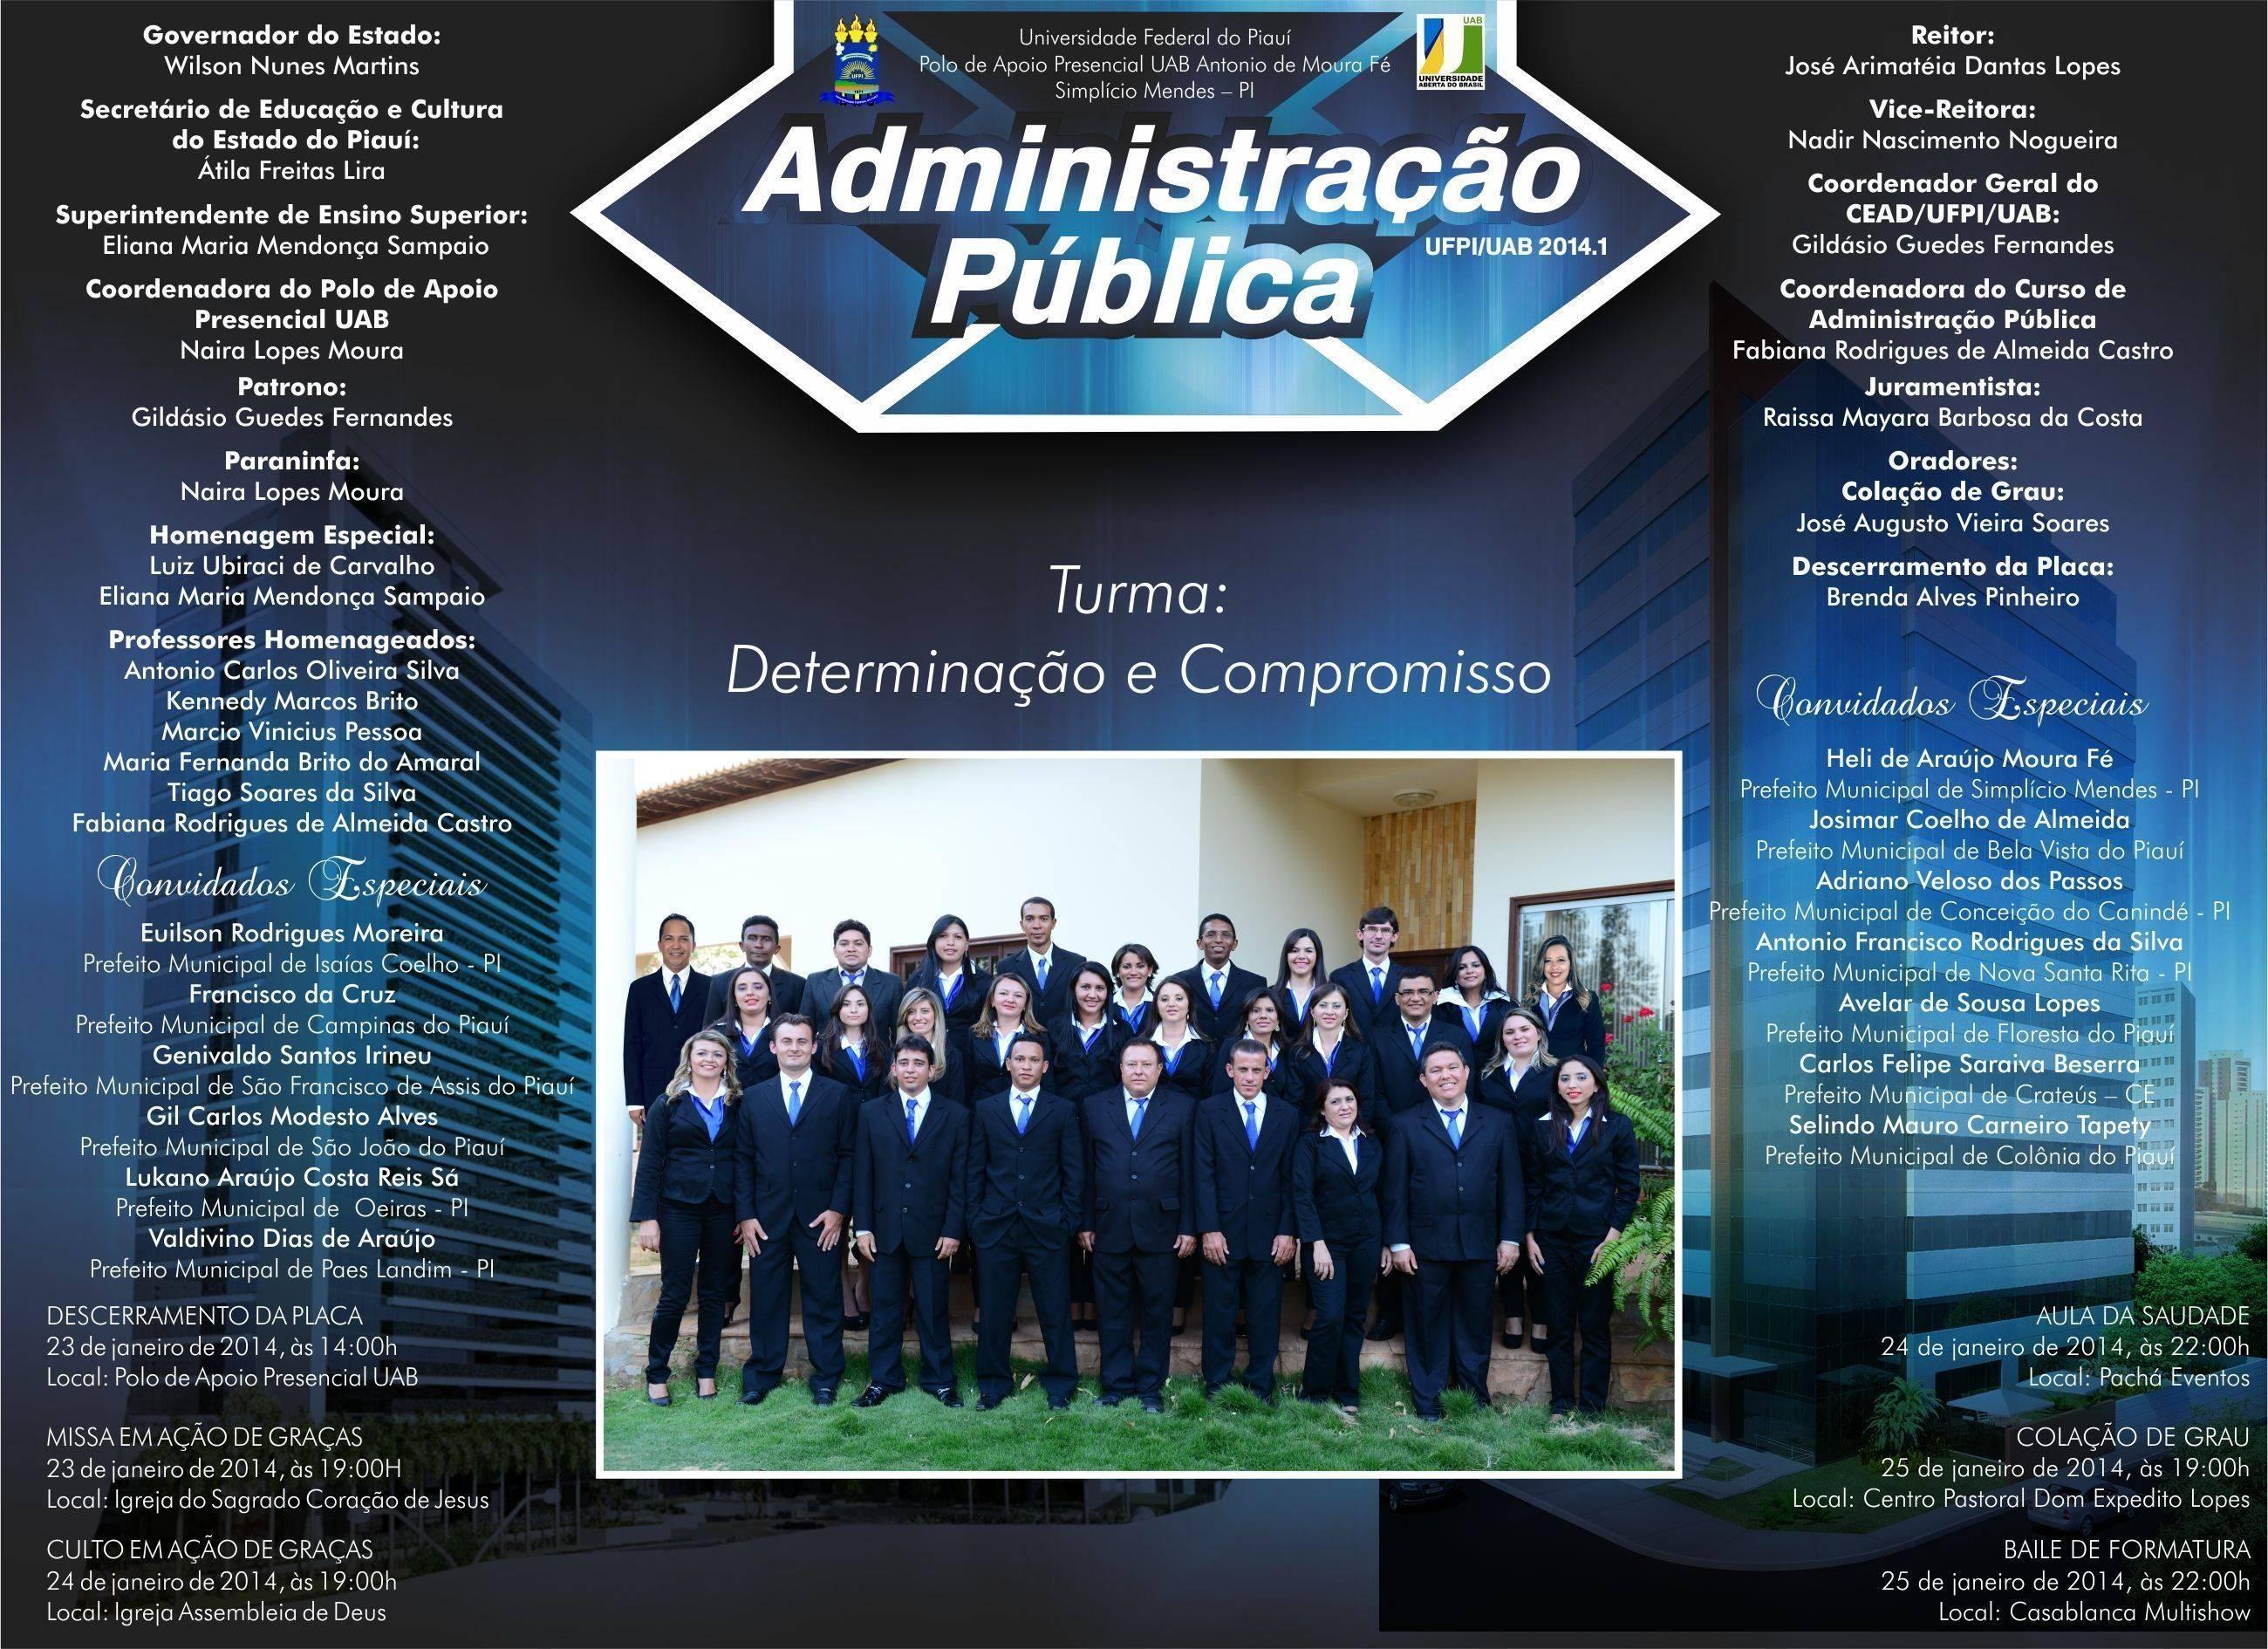 formatura-adm26